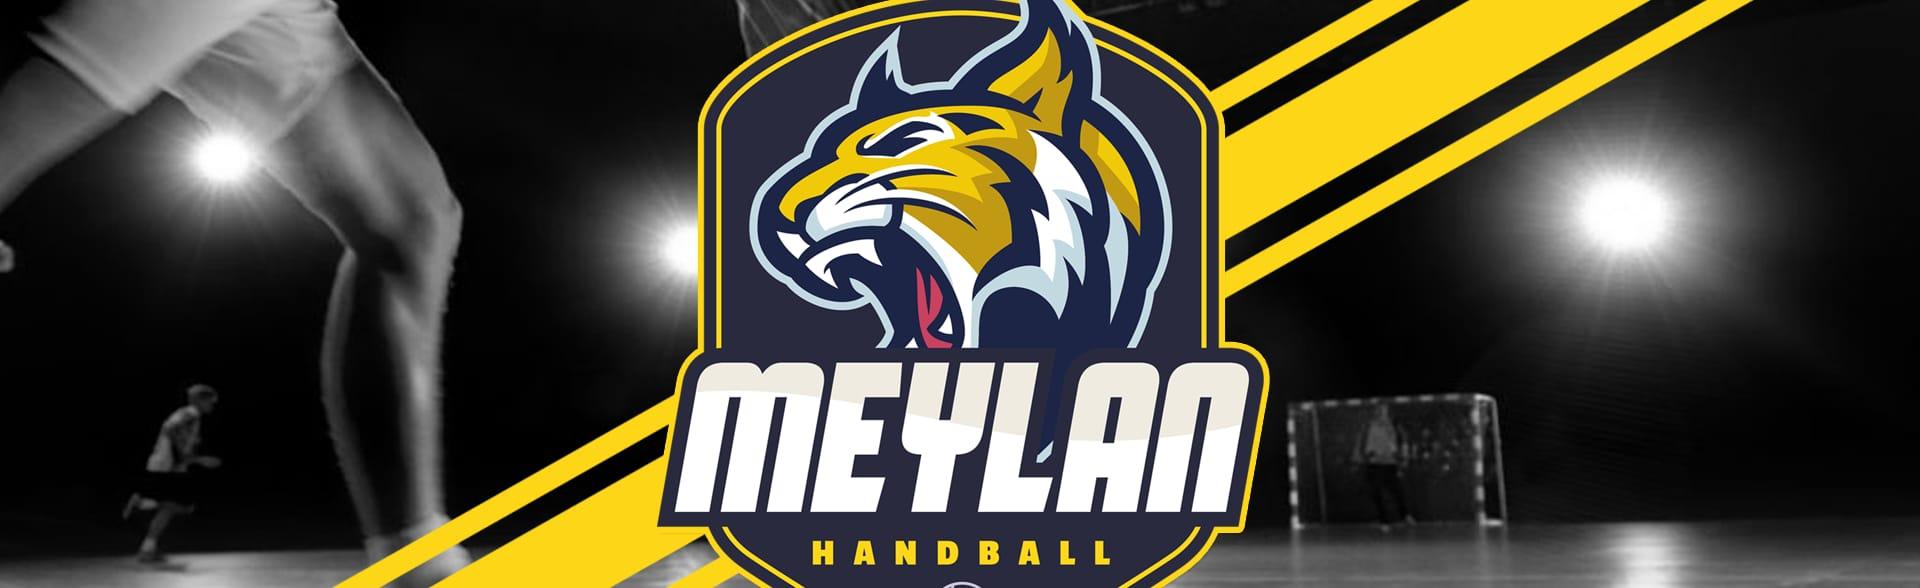 Meylan Handball